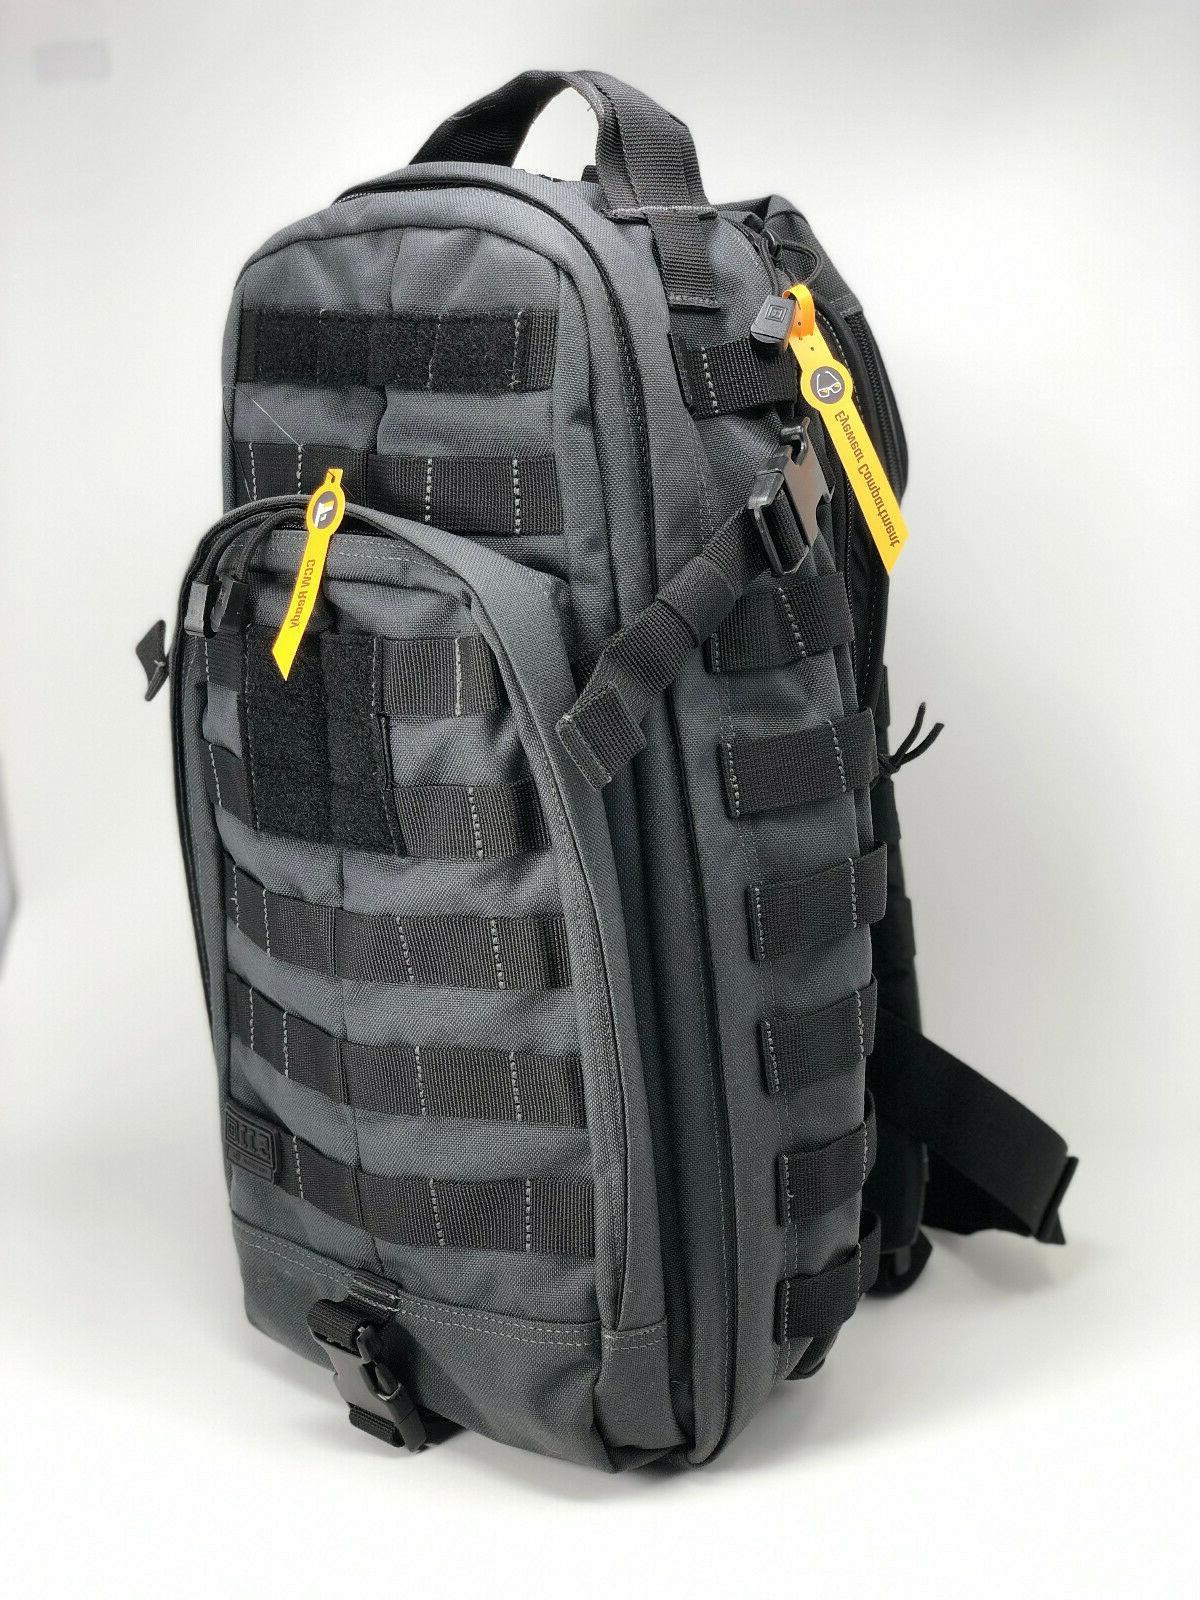 tactical 56964 rush moab 10